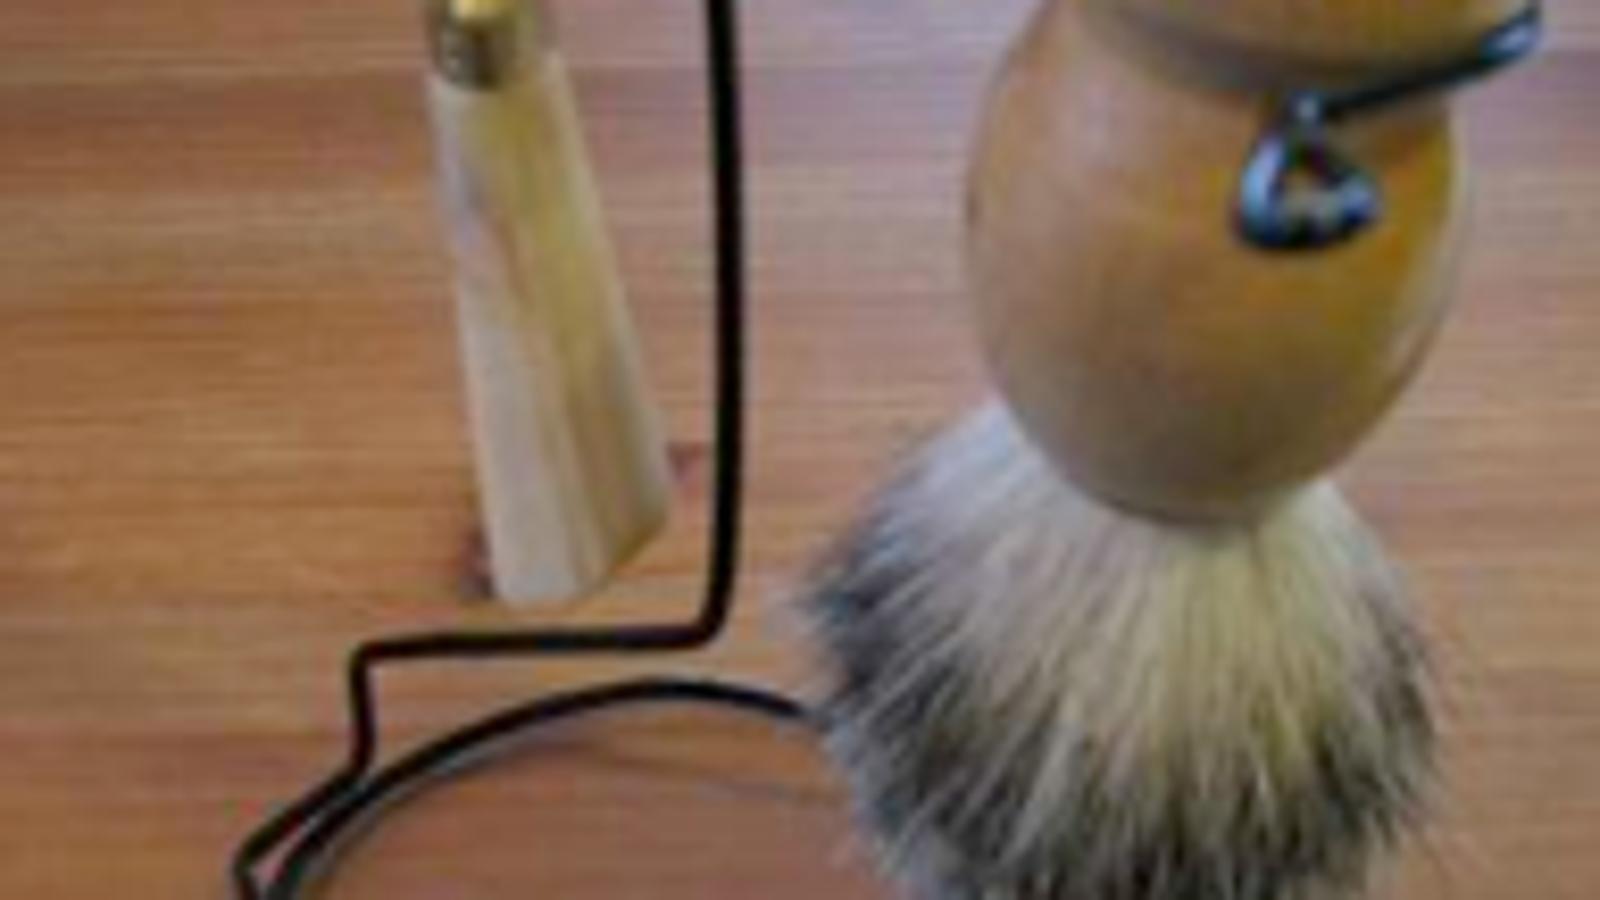 diy razor and shaving brush stand. Black Bedroom Furniture Sets. Home Design Ideas